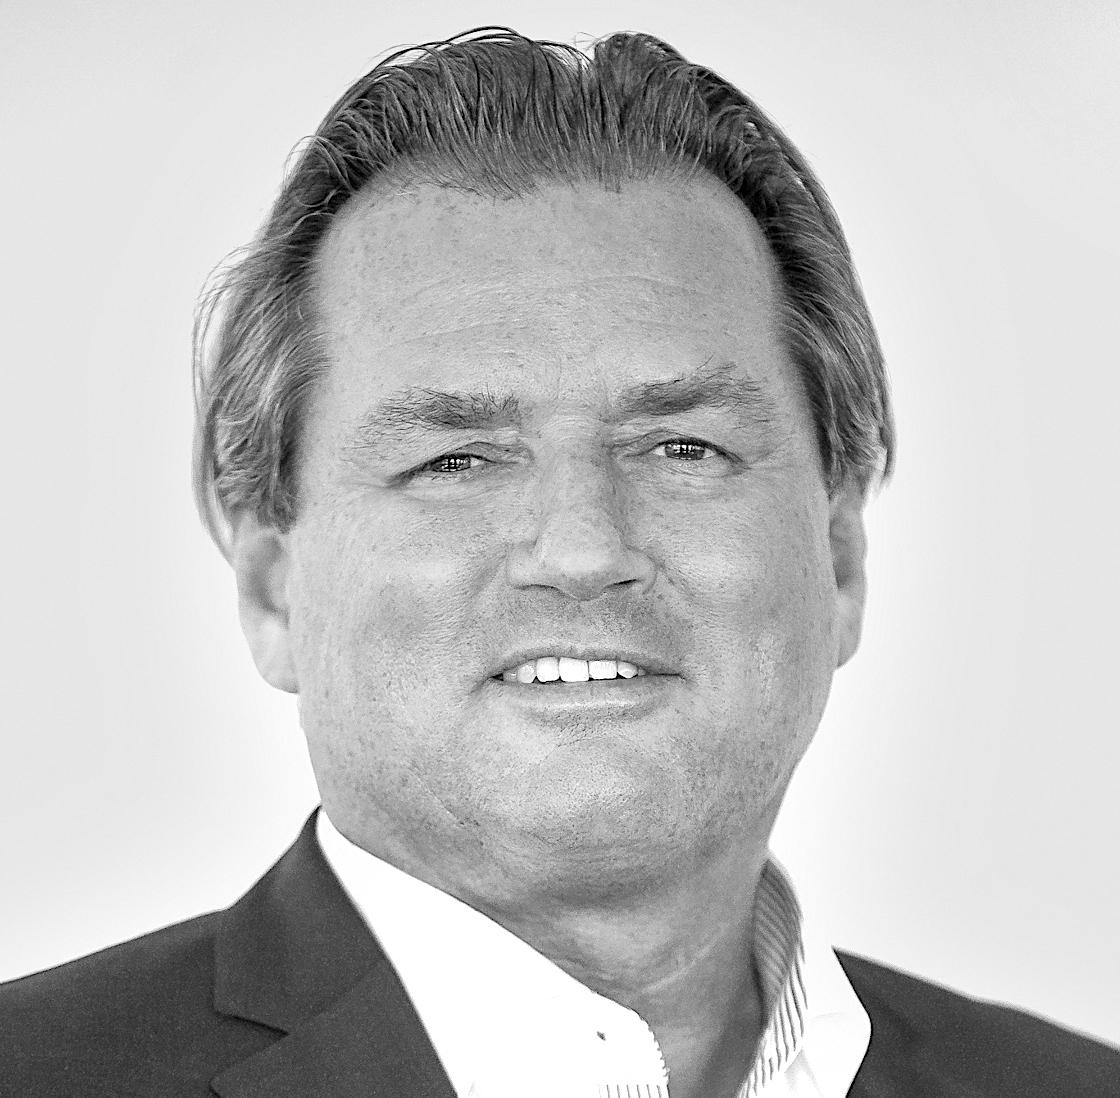 Thomas Reichenauer  Founder & Managing Director T +43 1 236 632 636 2 M +43 664 413 58 91  thomas.reichenauer@ros-management.com